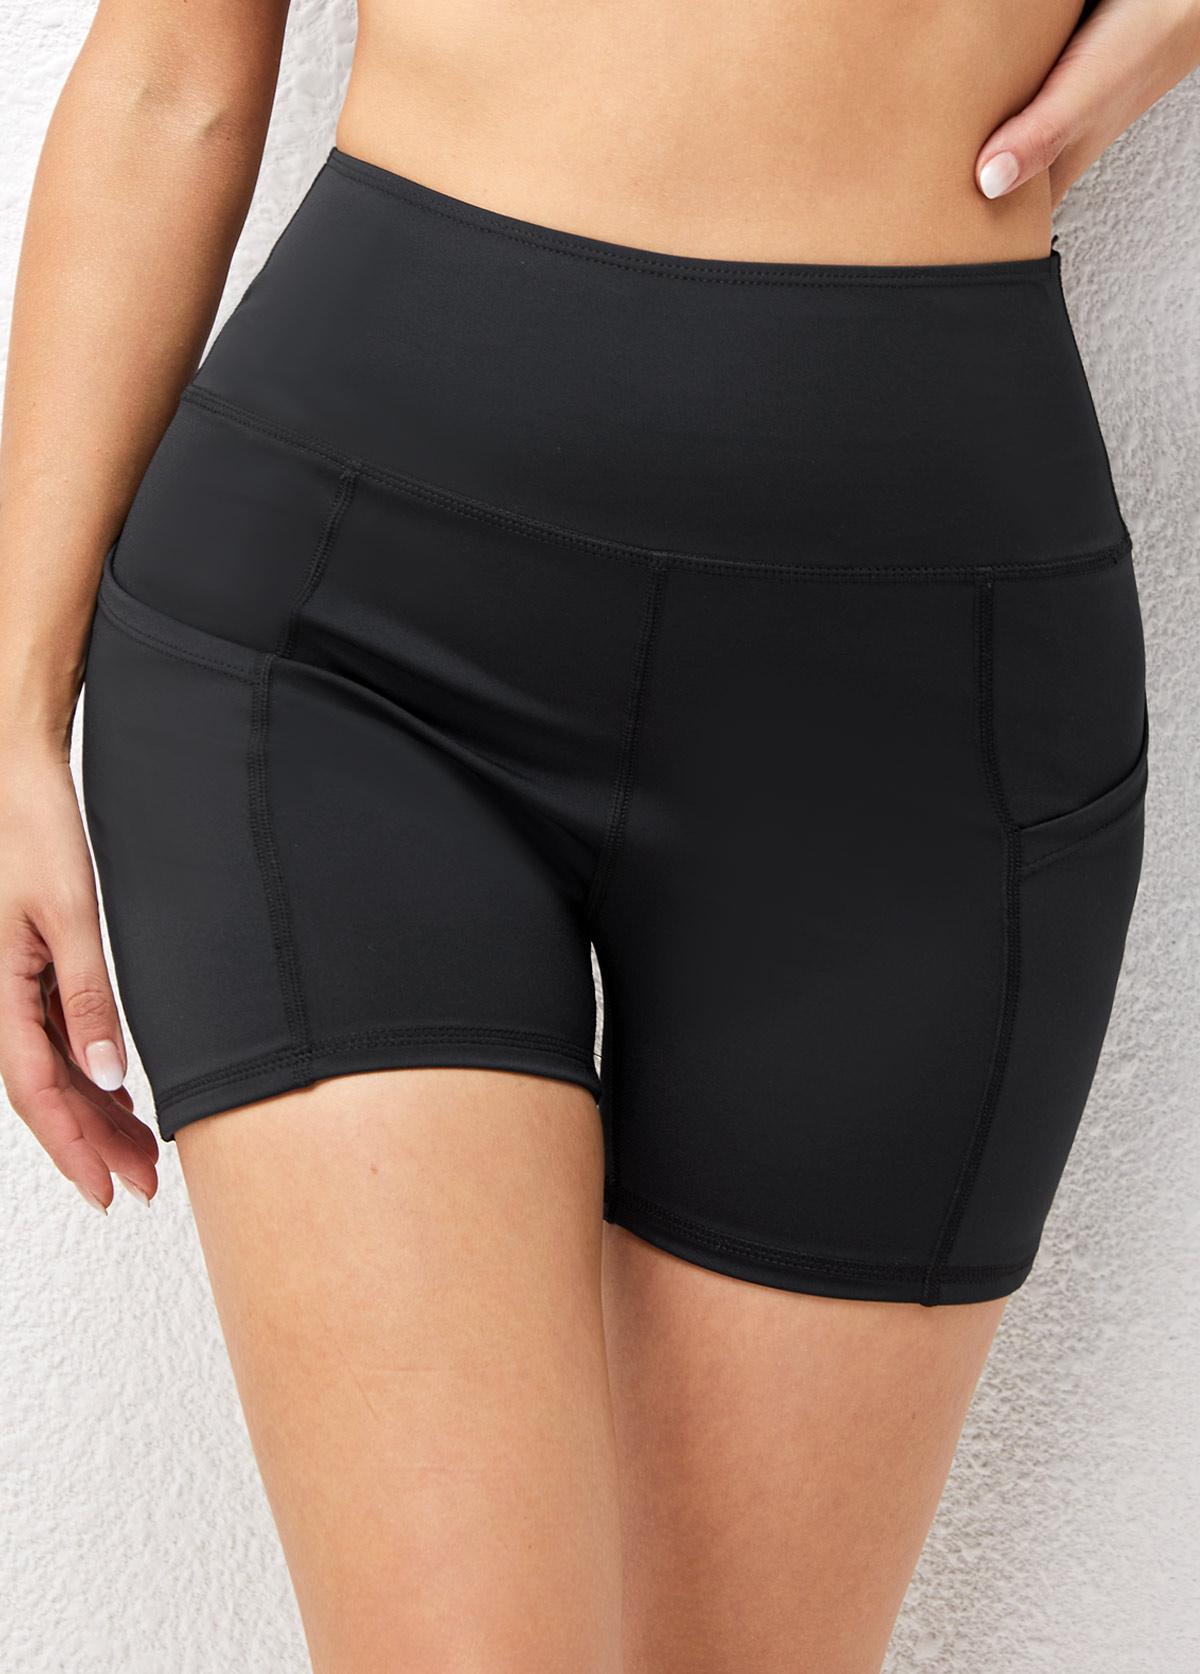 ROTITA High Waisted Pocket Skinny Solid Sports Bottom